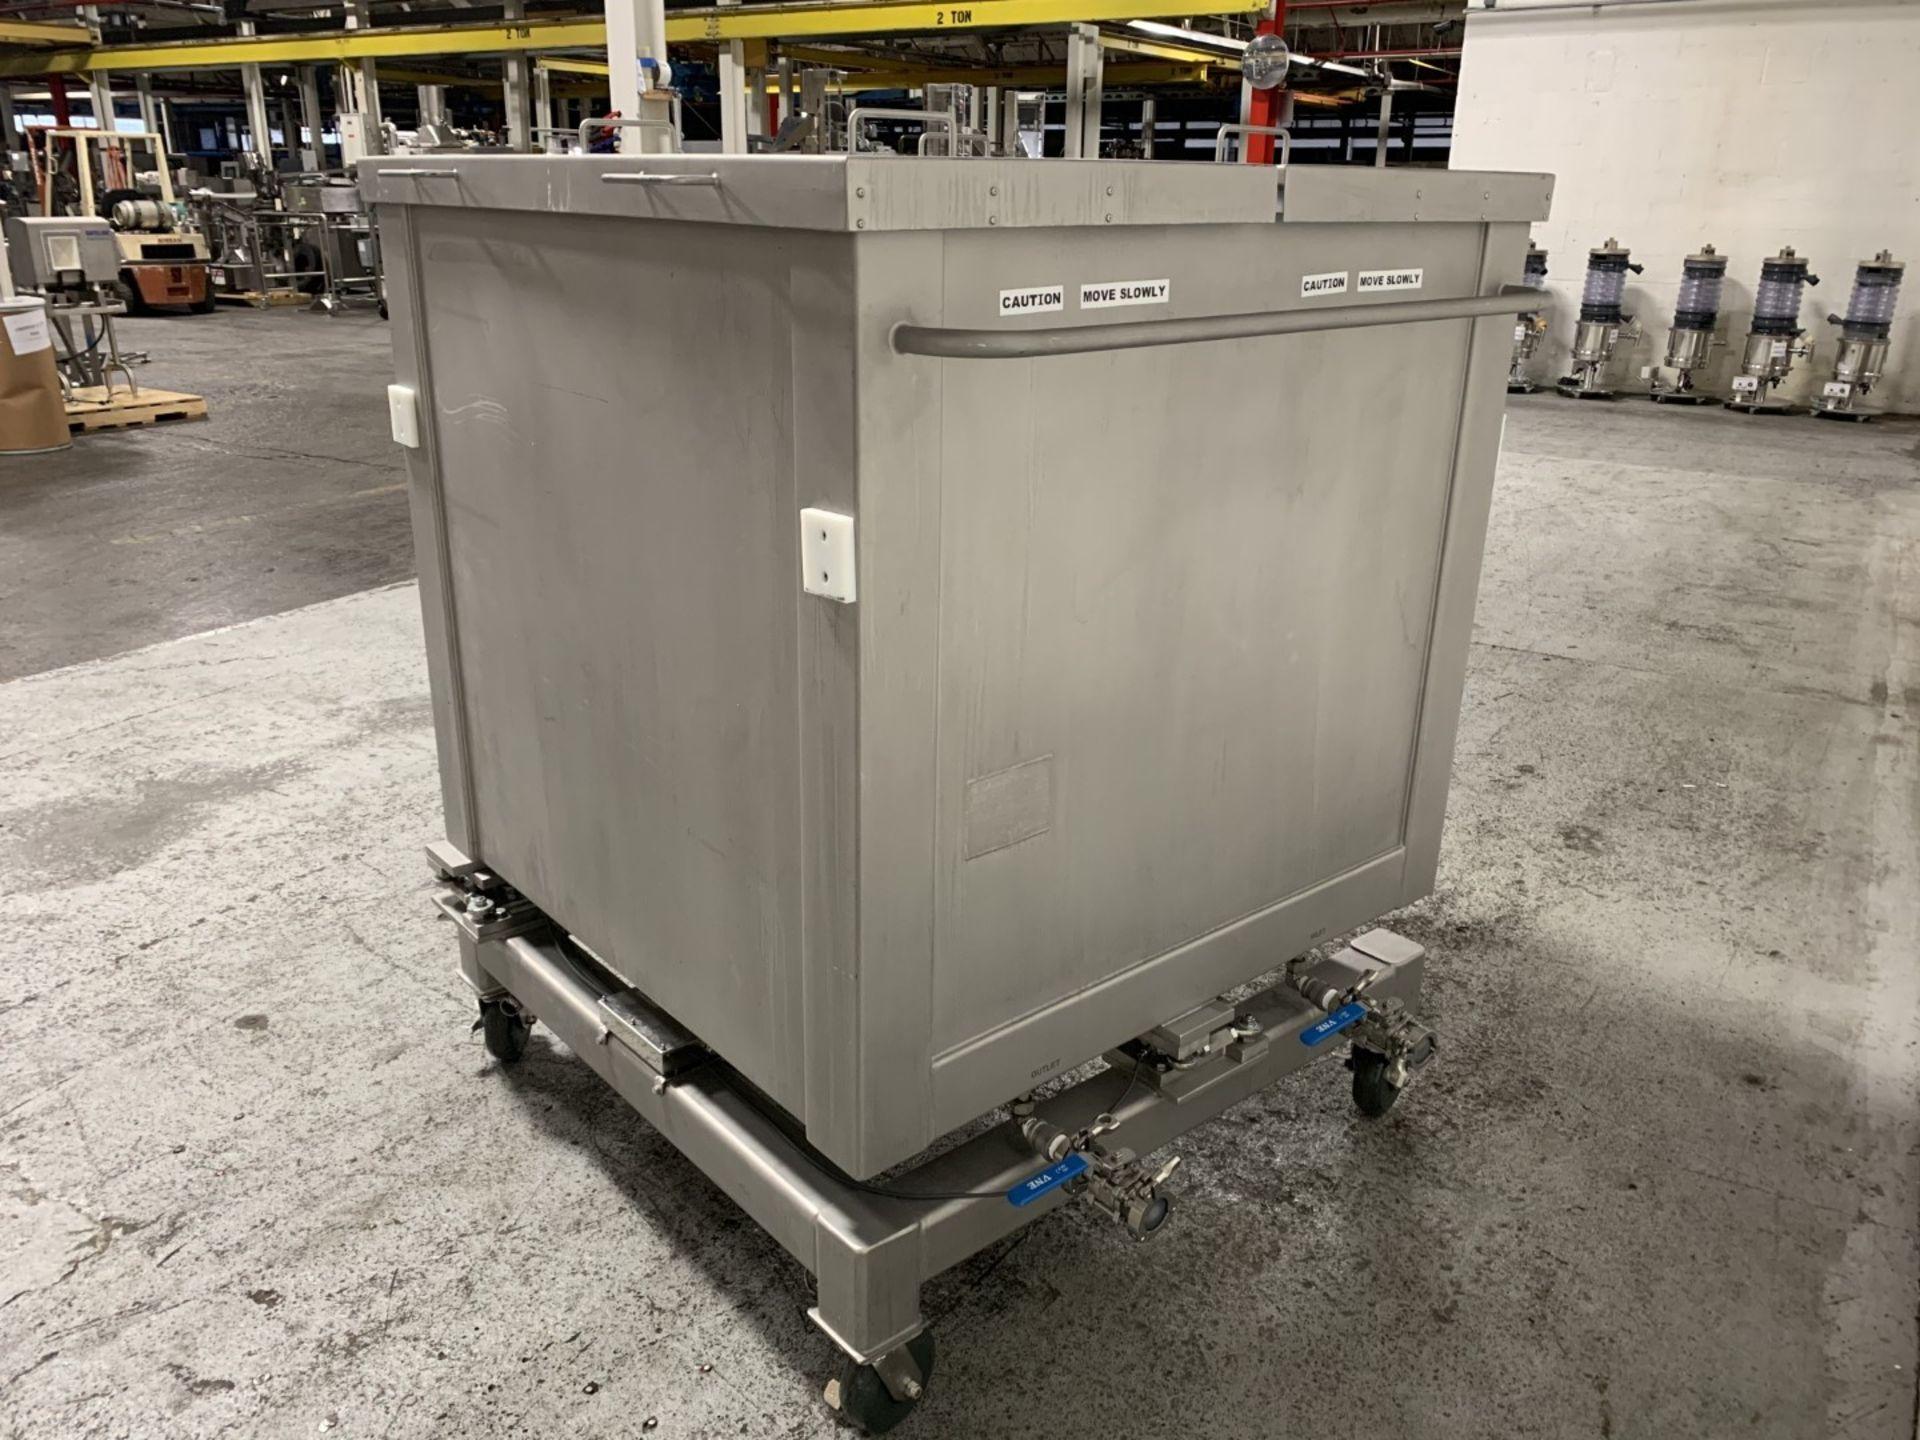 Lot 21 - 1000 Liter Sartorius ETO Palletank, Product code/model FXC214390, 304 stainless steel